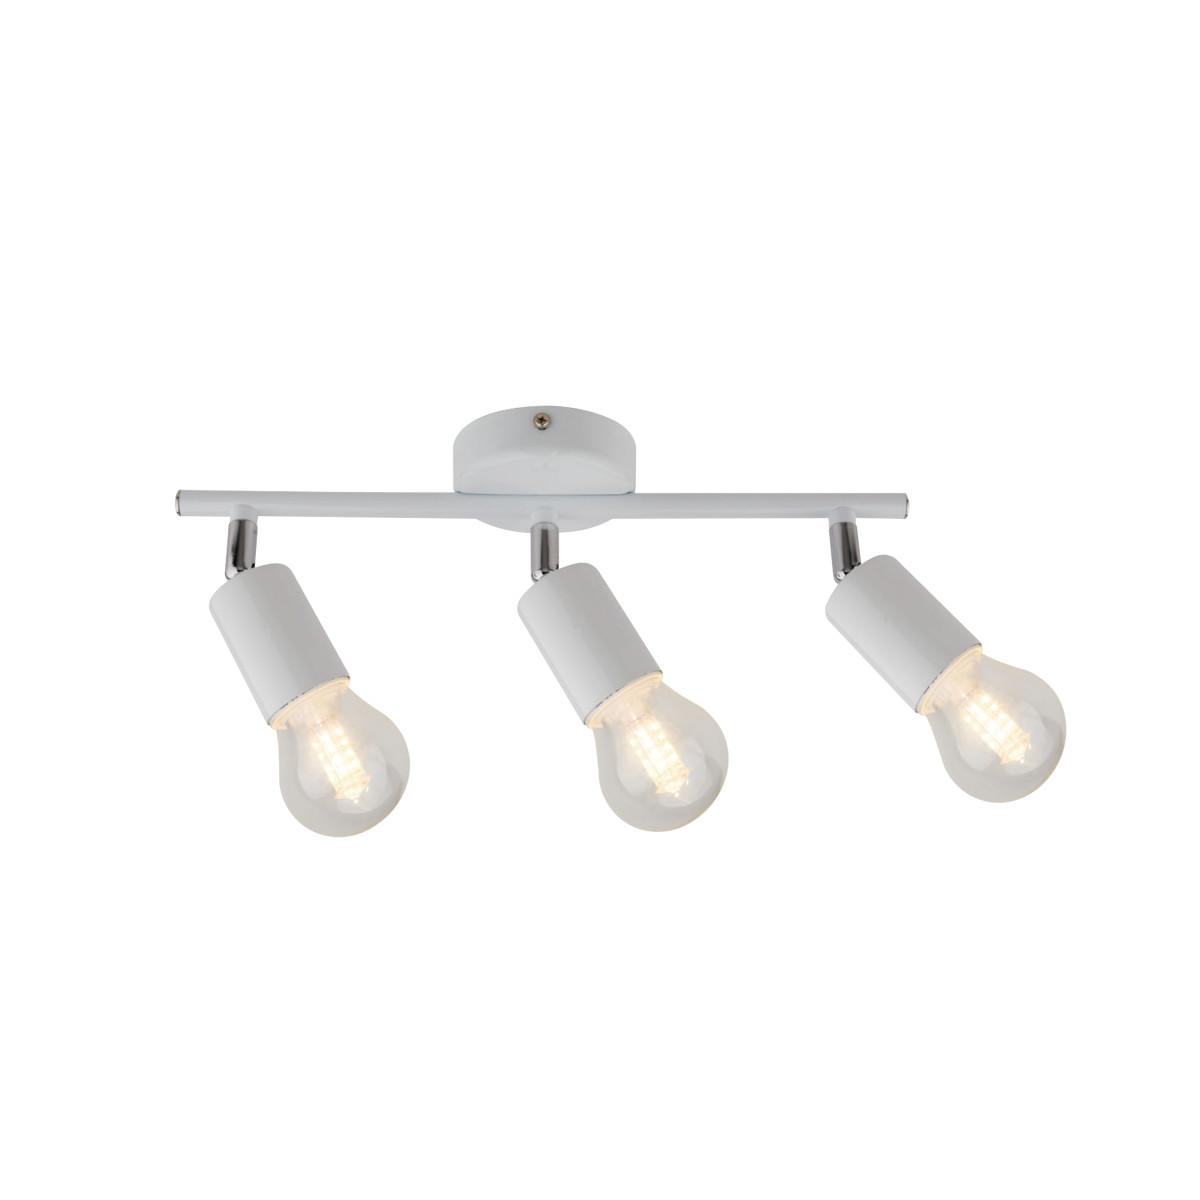 Спот поворотный Basico 3 лампы 9 м² цвет белый